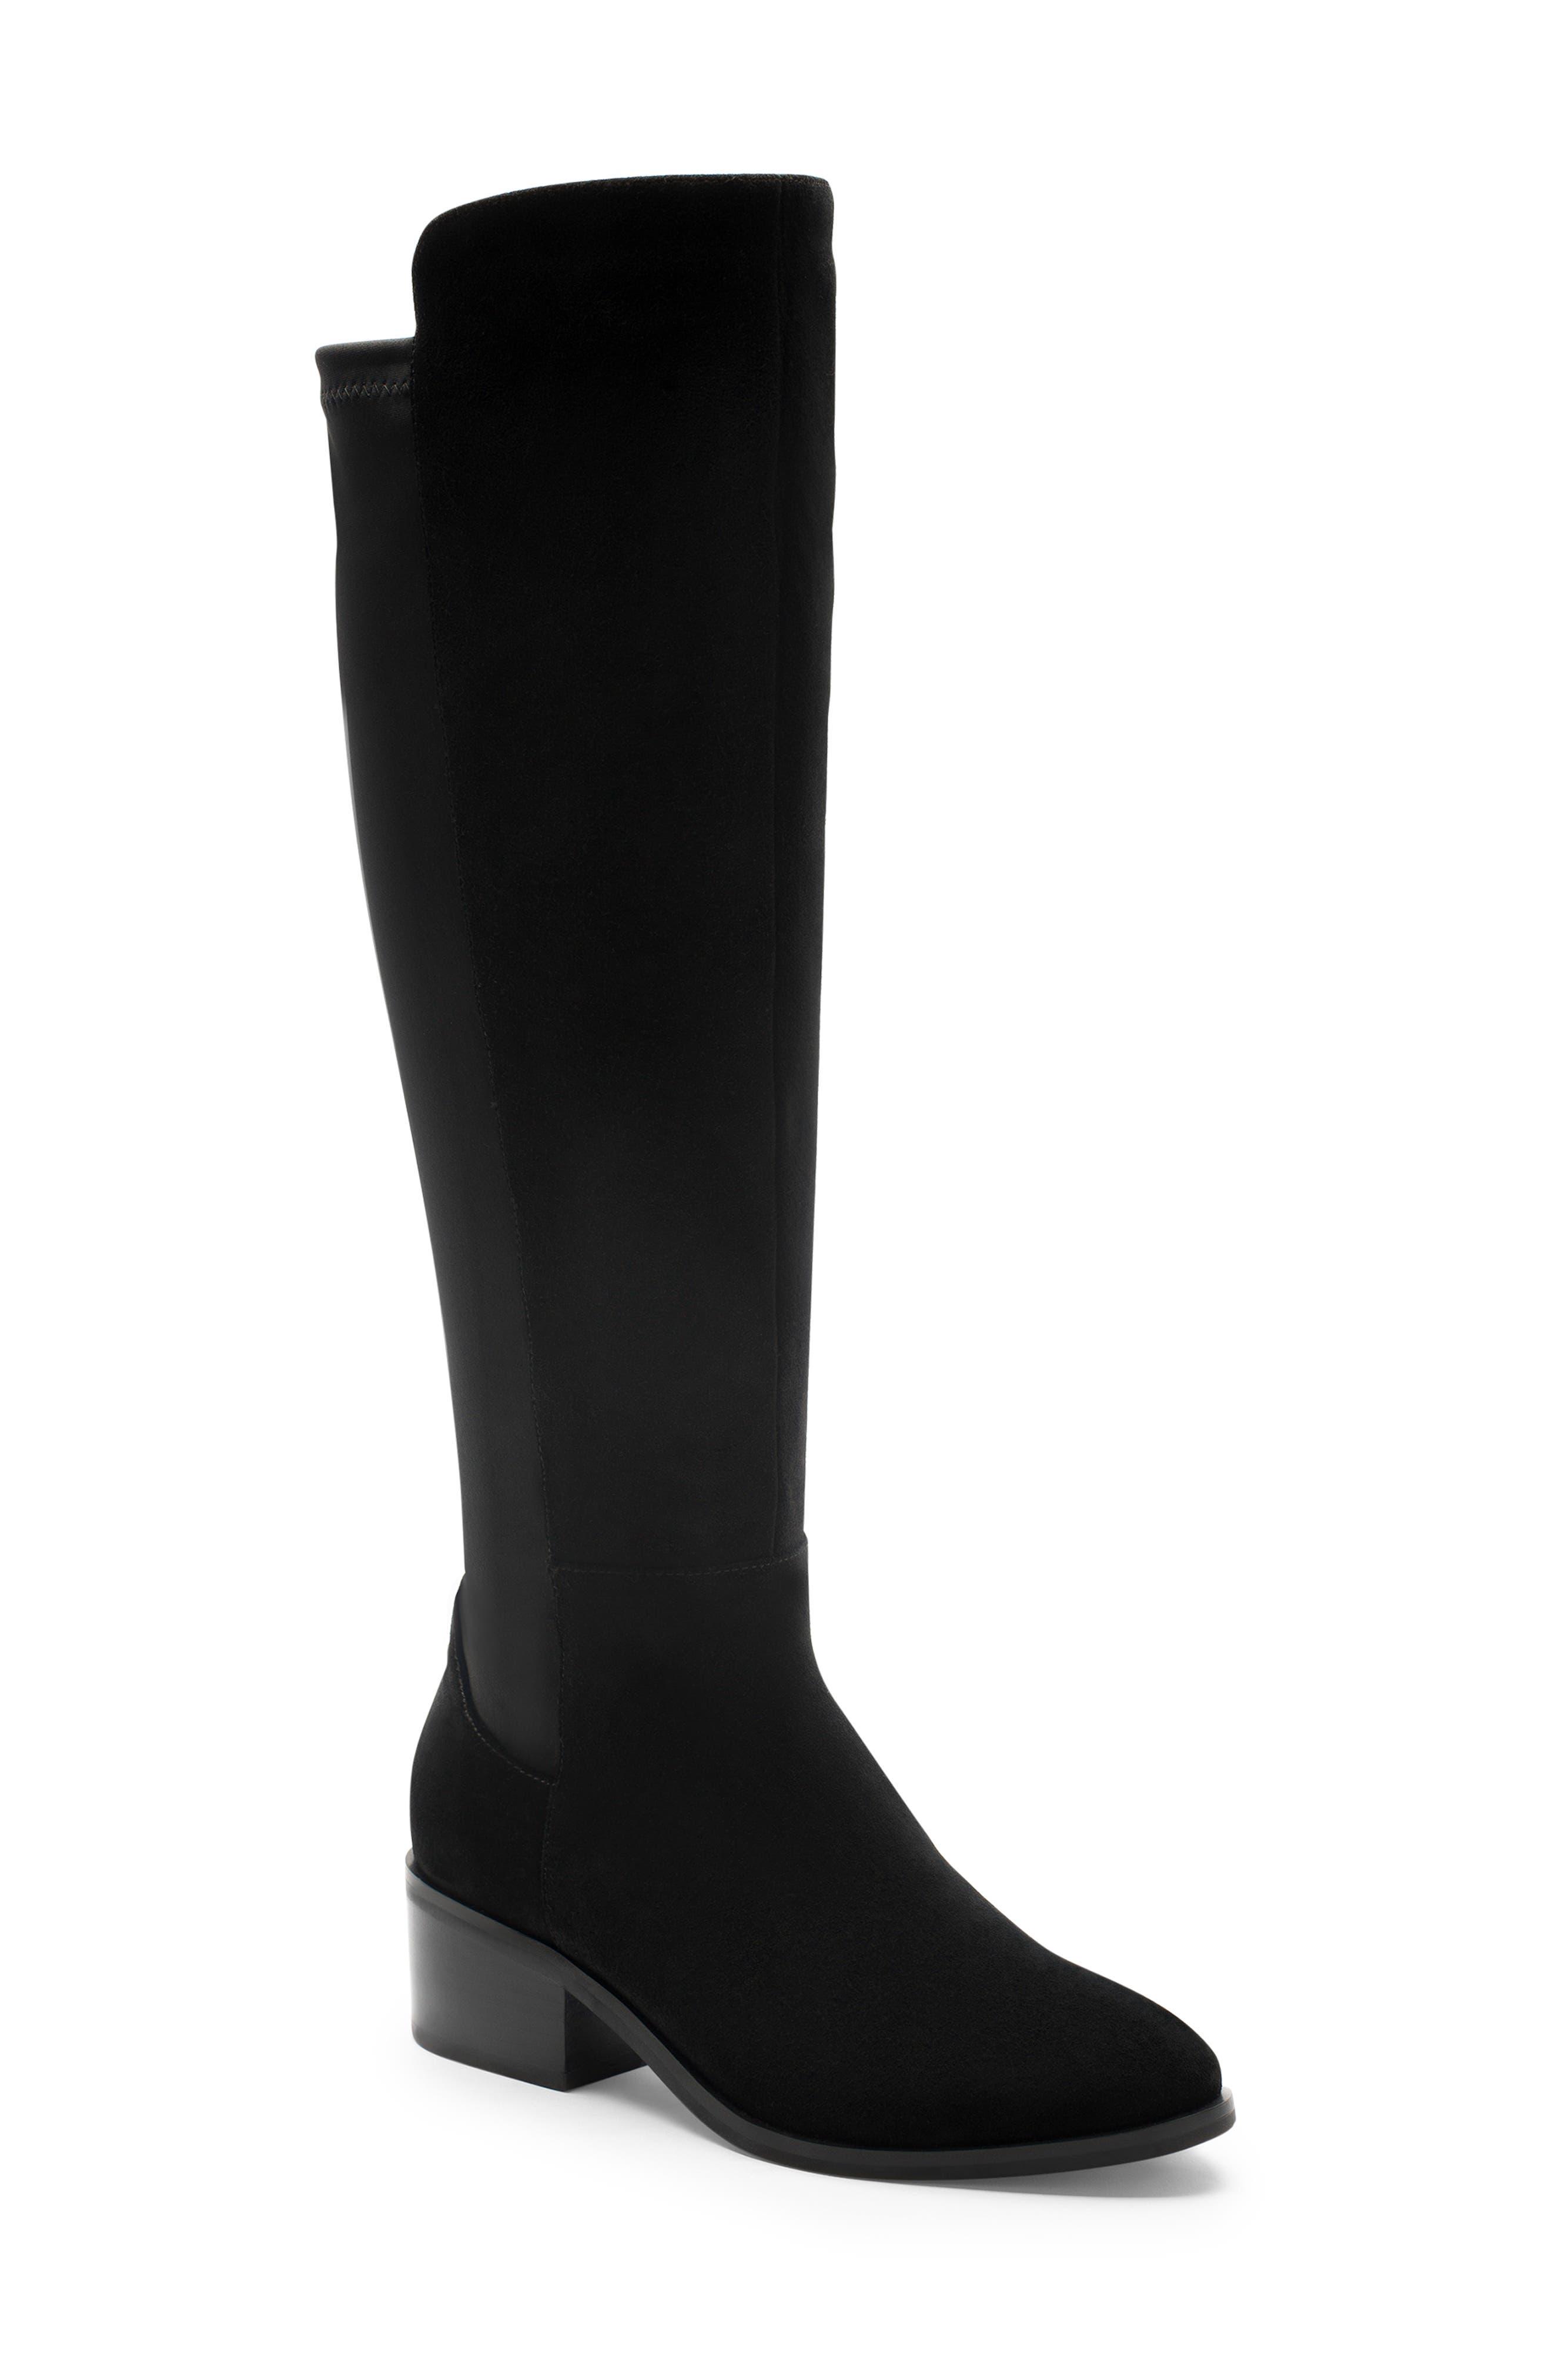 Image of Blondo Gallo Knee-High Waterproof Boot